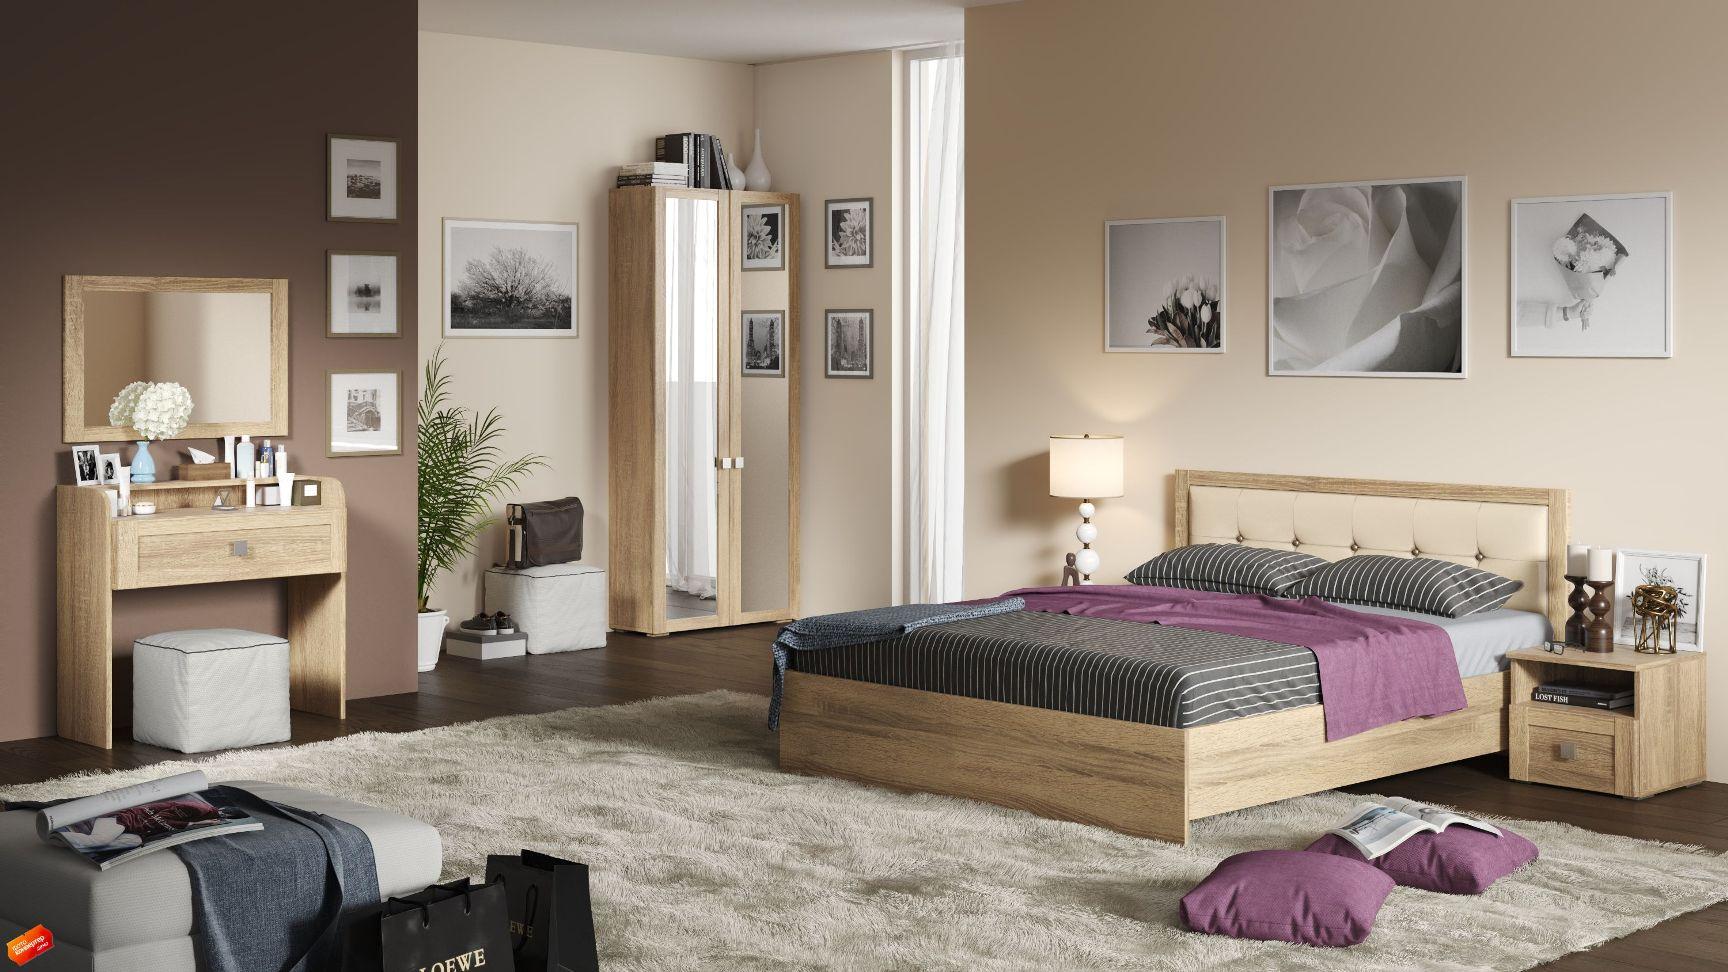 Модульная спальня Корсика Композиция-1 модульная спальня корсика композиция 1